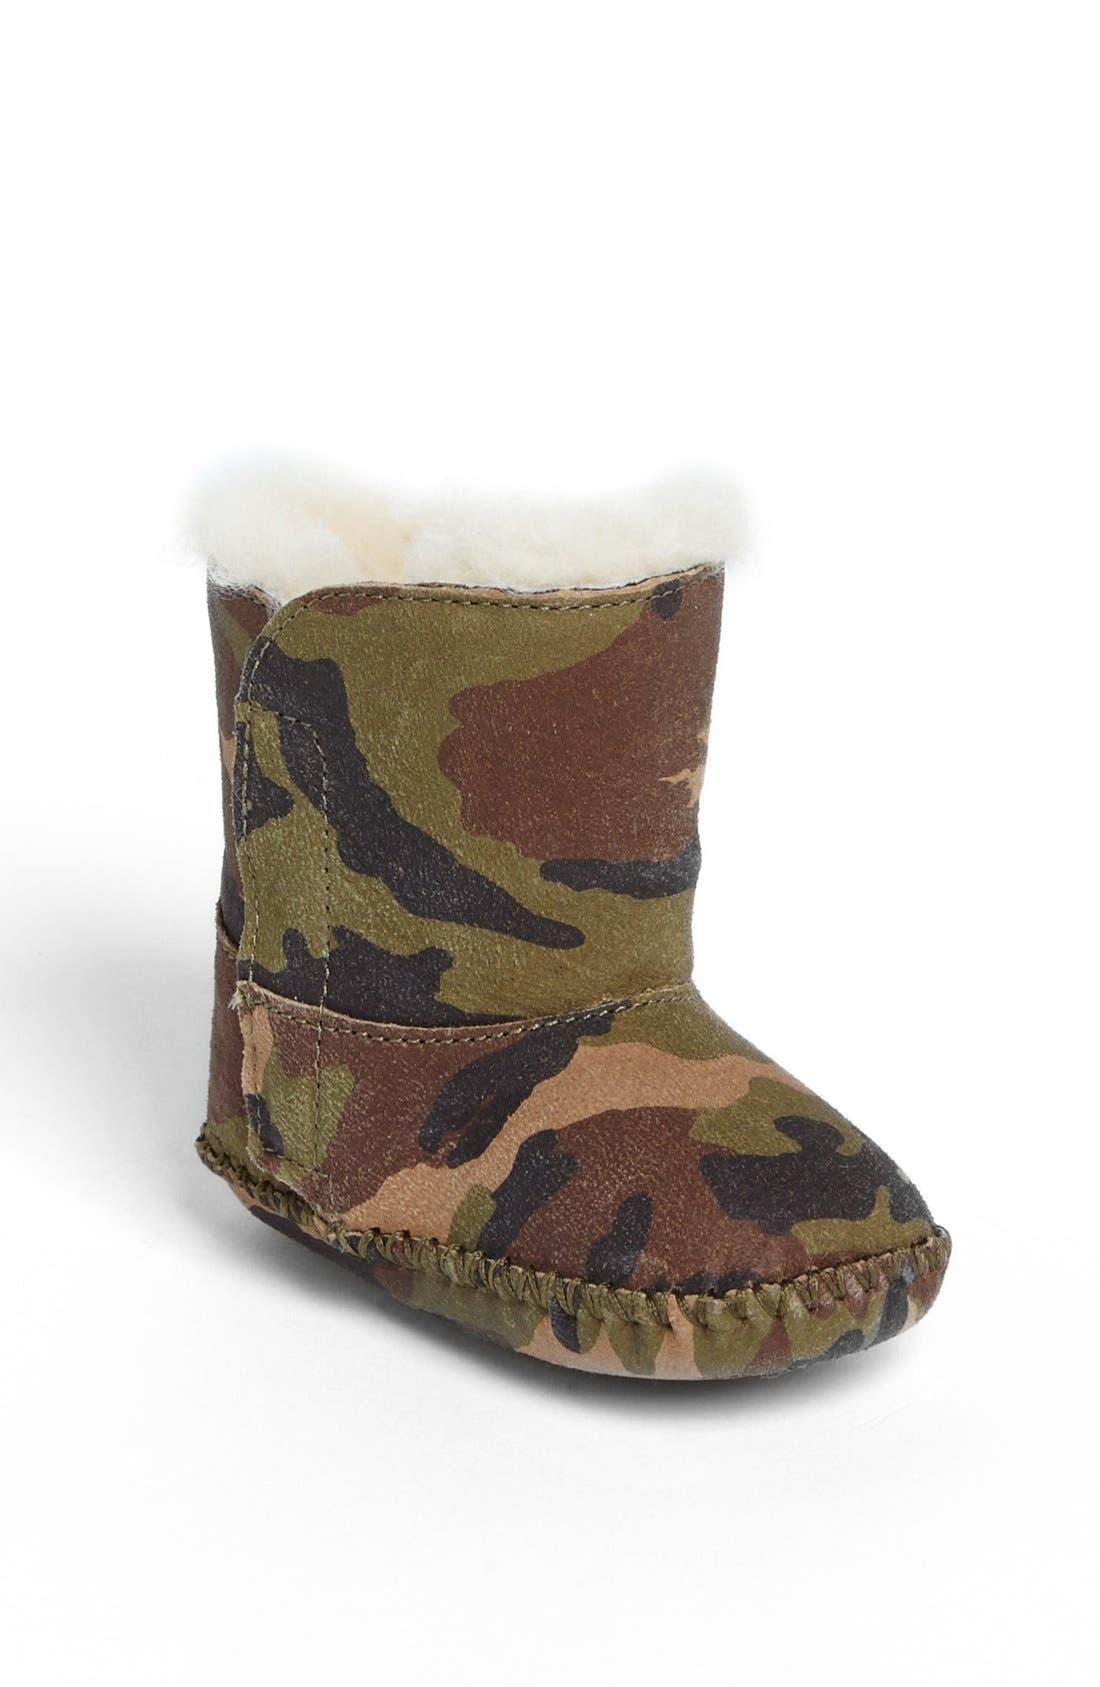 Alternate Image 1 Selected - UGG® 'Caden' Boot (Baby)